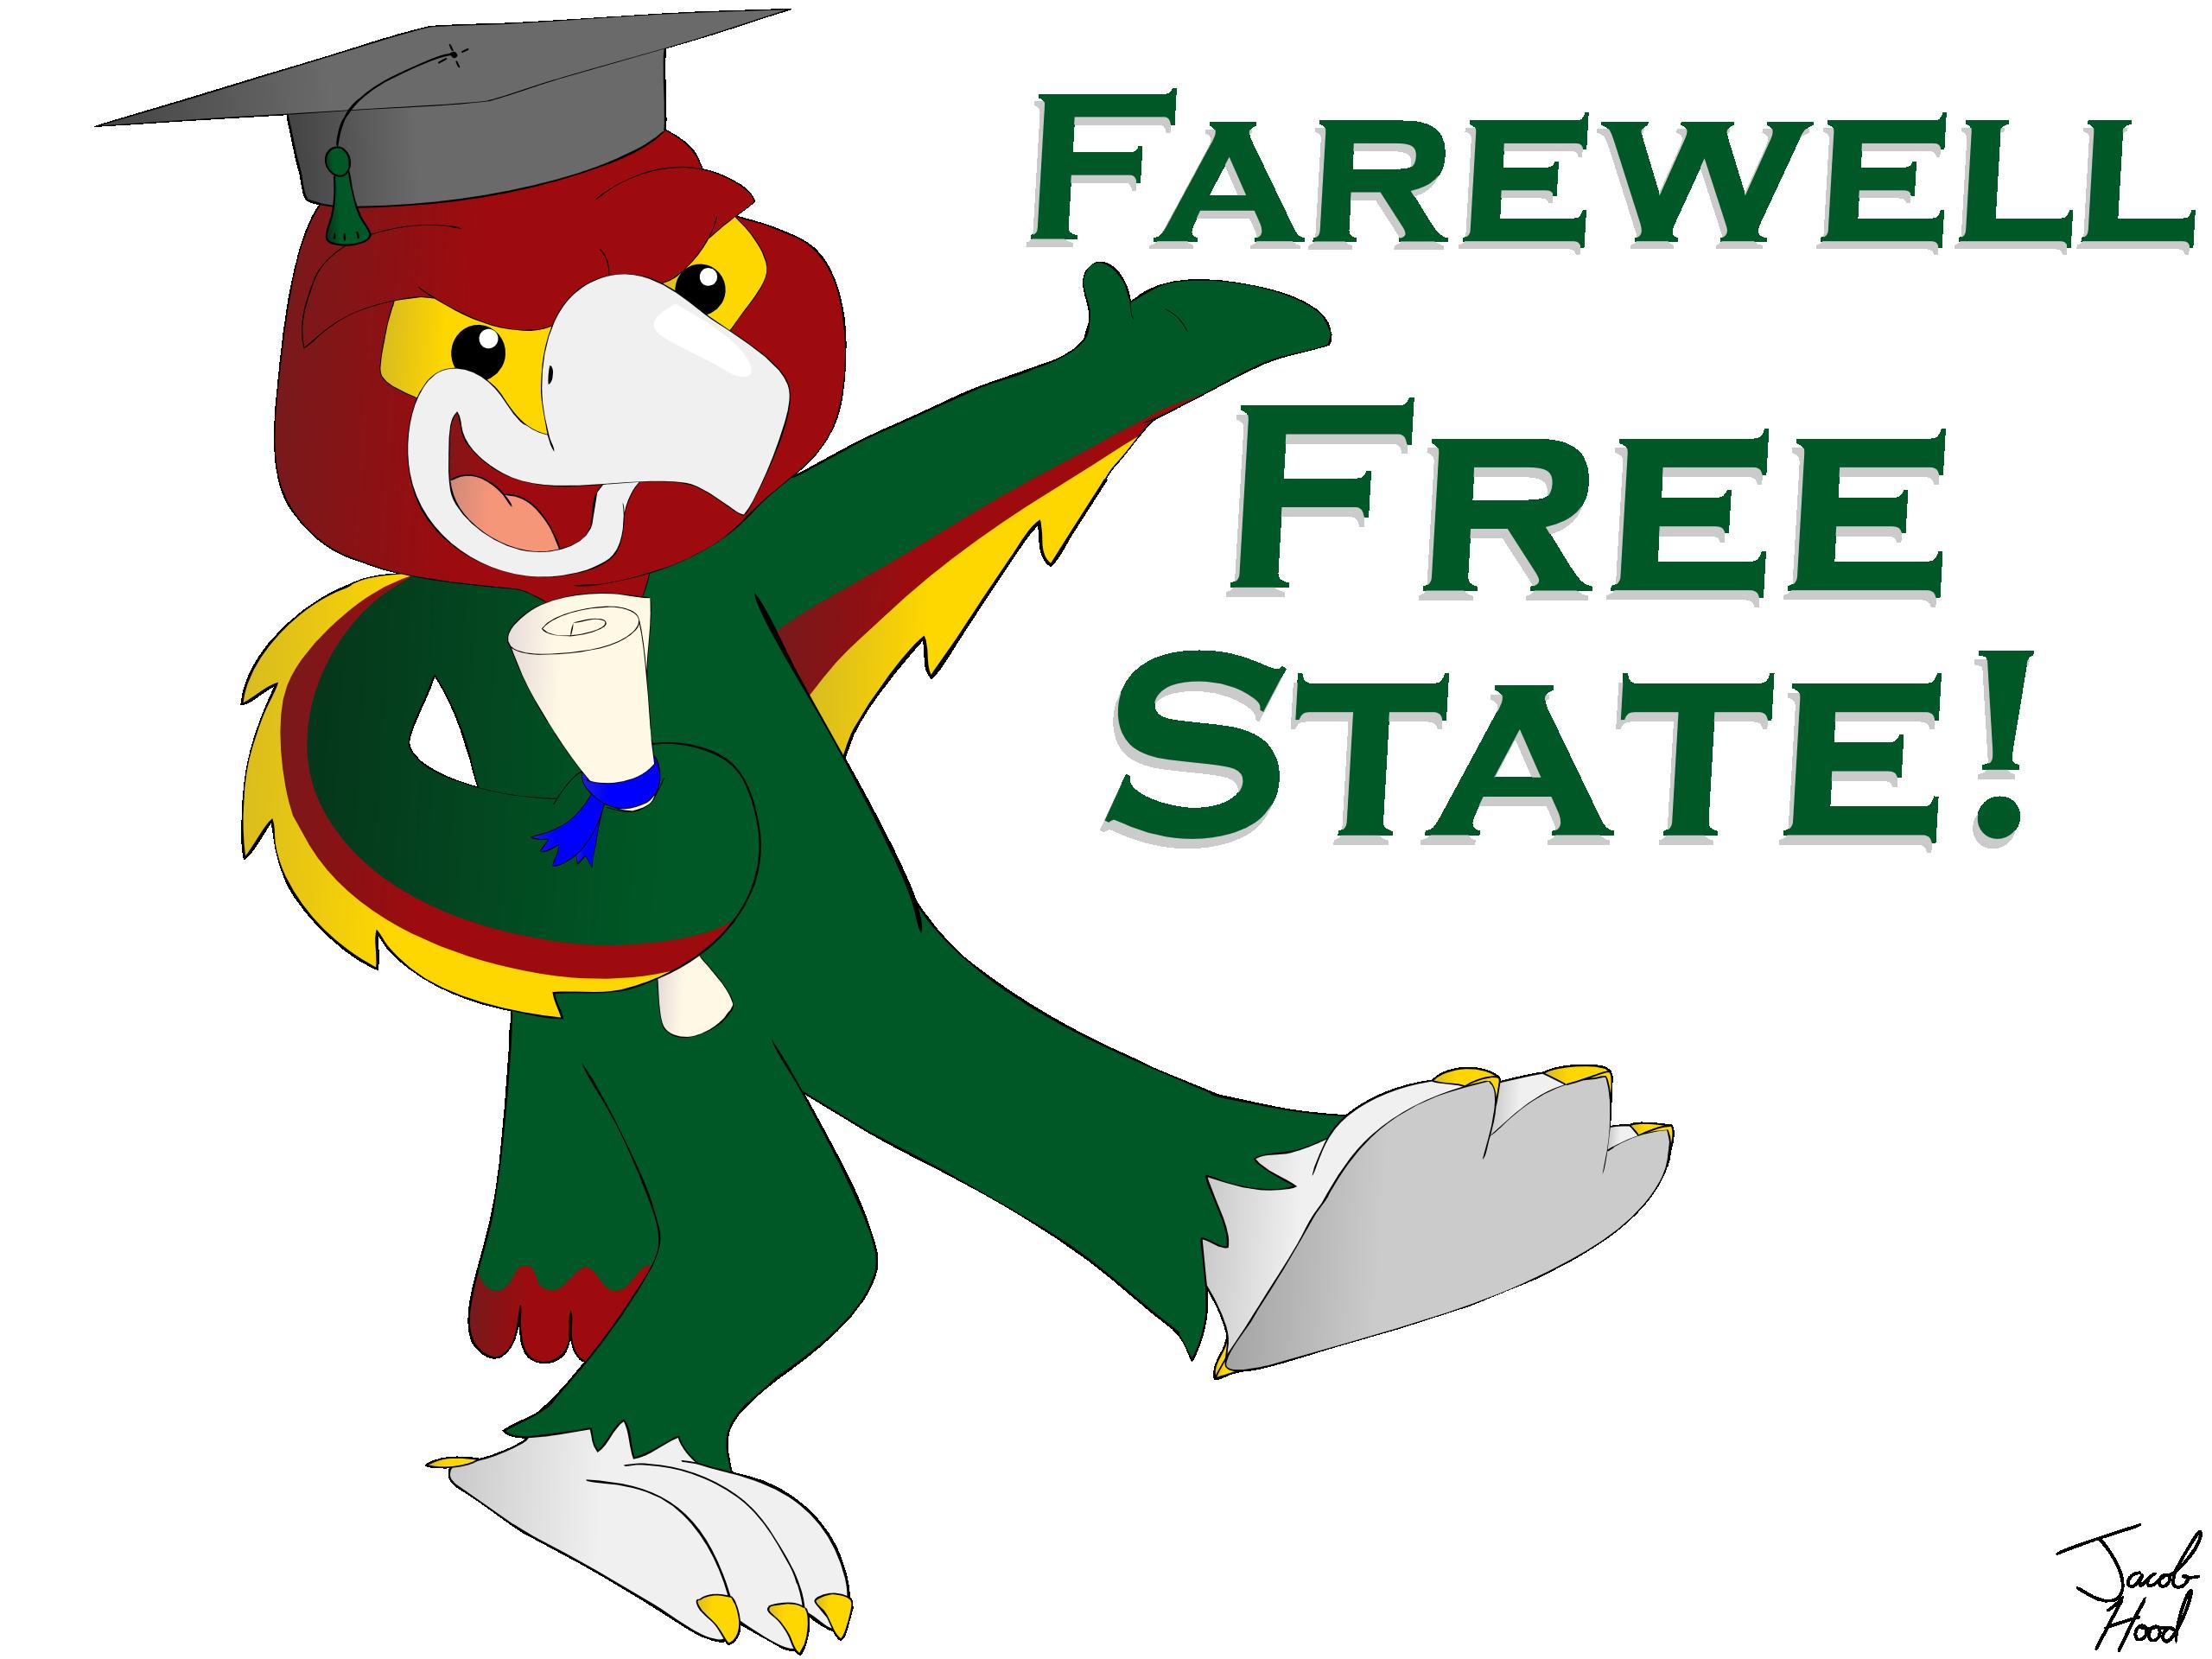 The jacob hood website. Graduate clipart school farewell